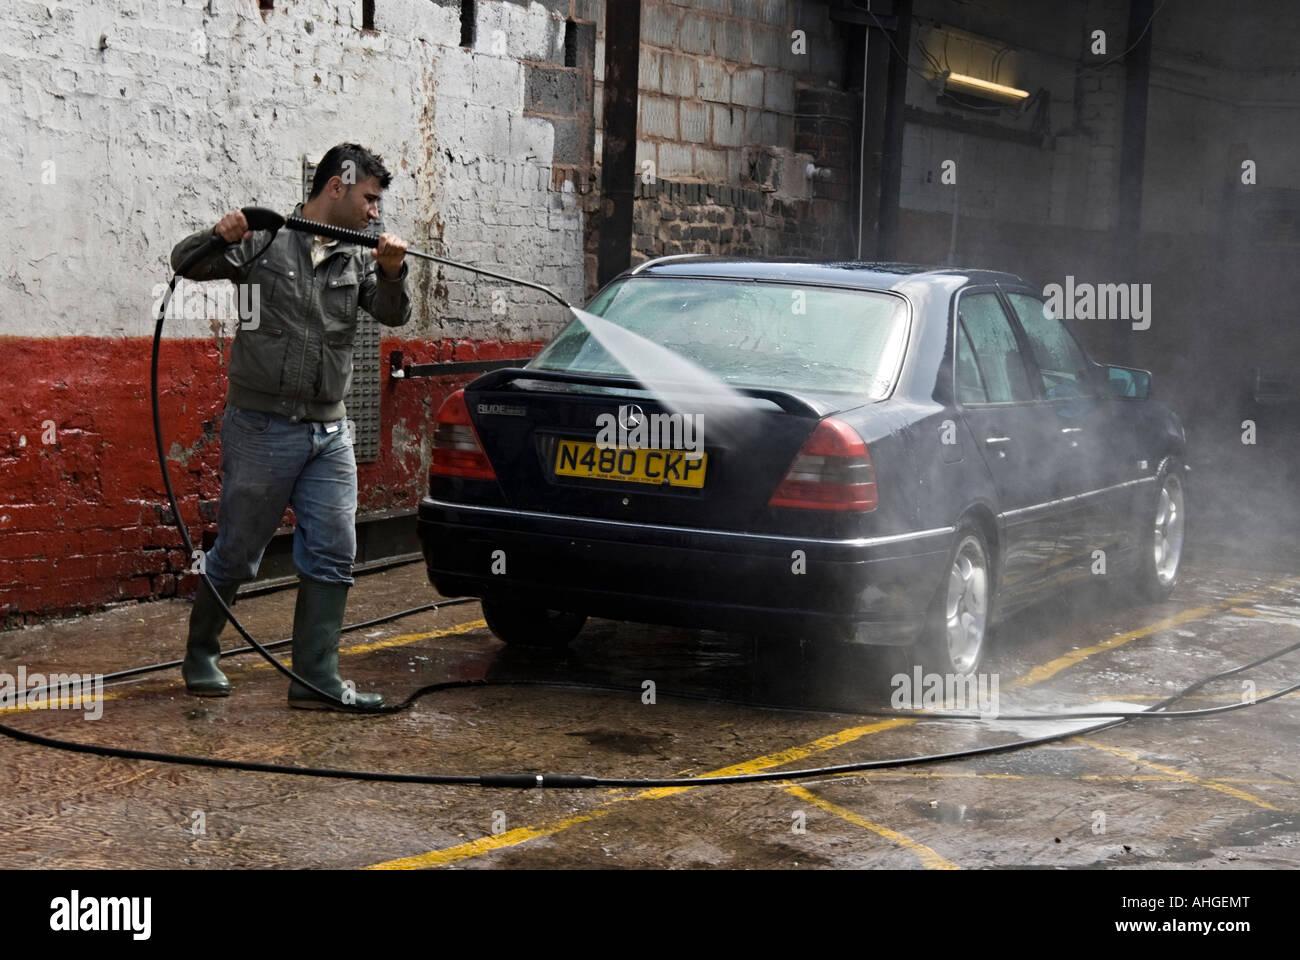 Spray Car Wash >> Hand Car Wash Using Pressurized Water Jet Spray Stock Photo